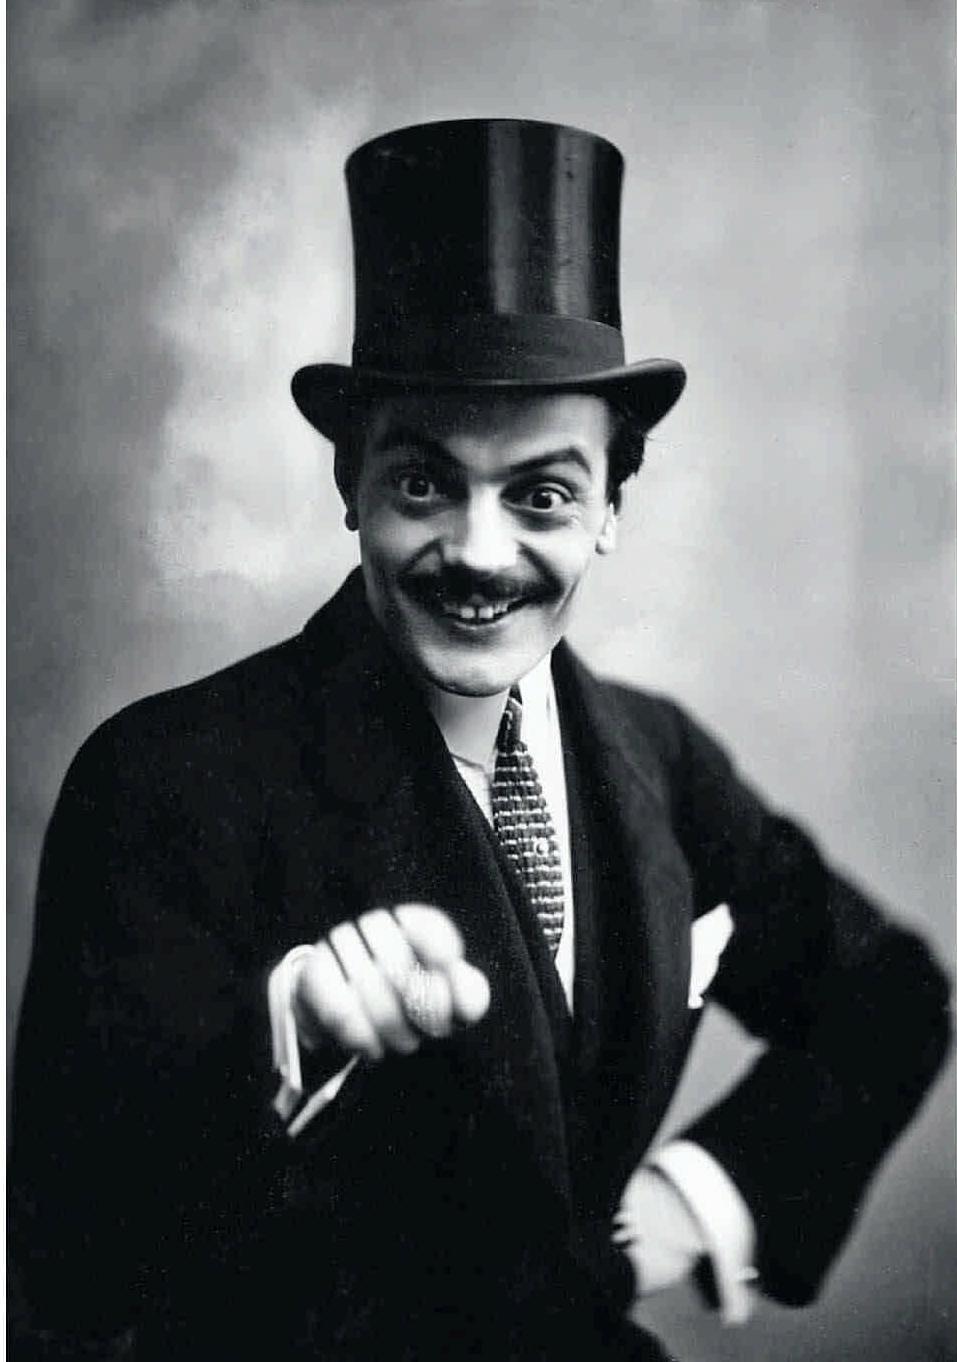 1913. Актер и режиссер Макс Линдер в Санкт-Петербурге